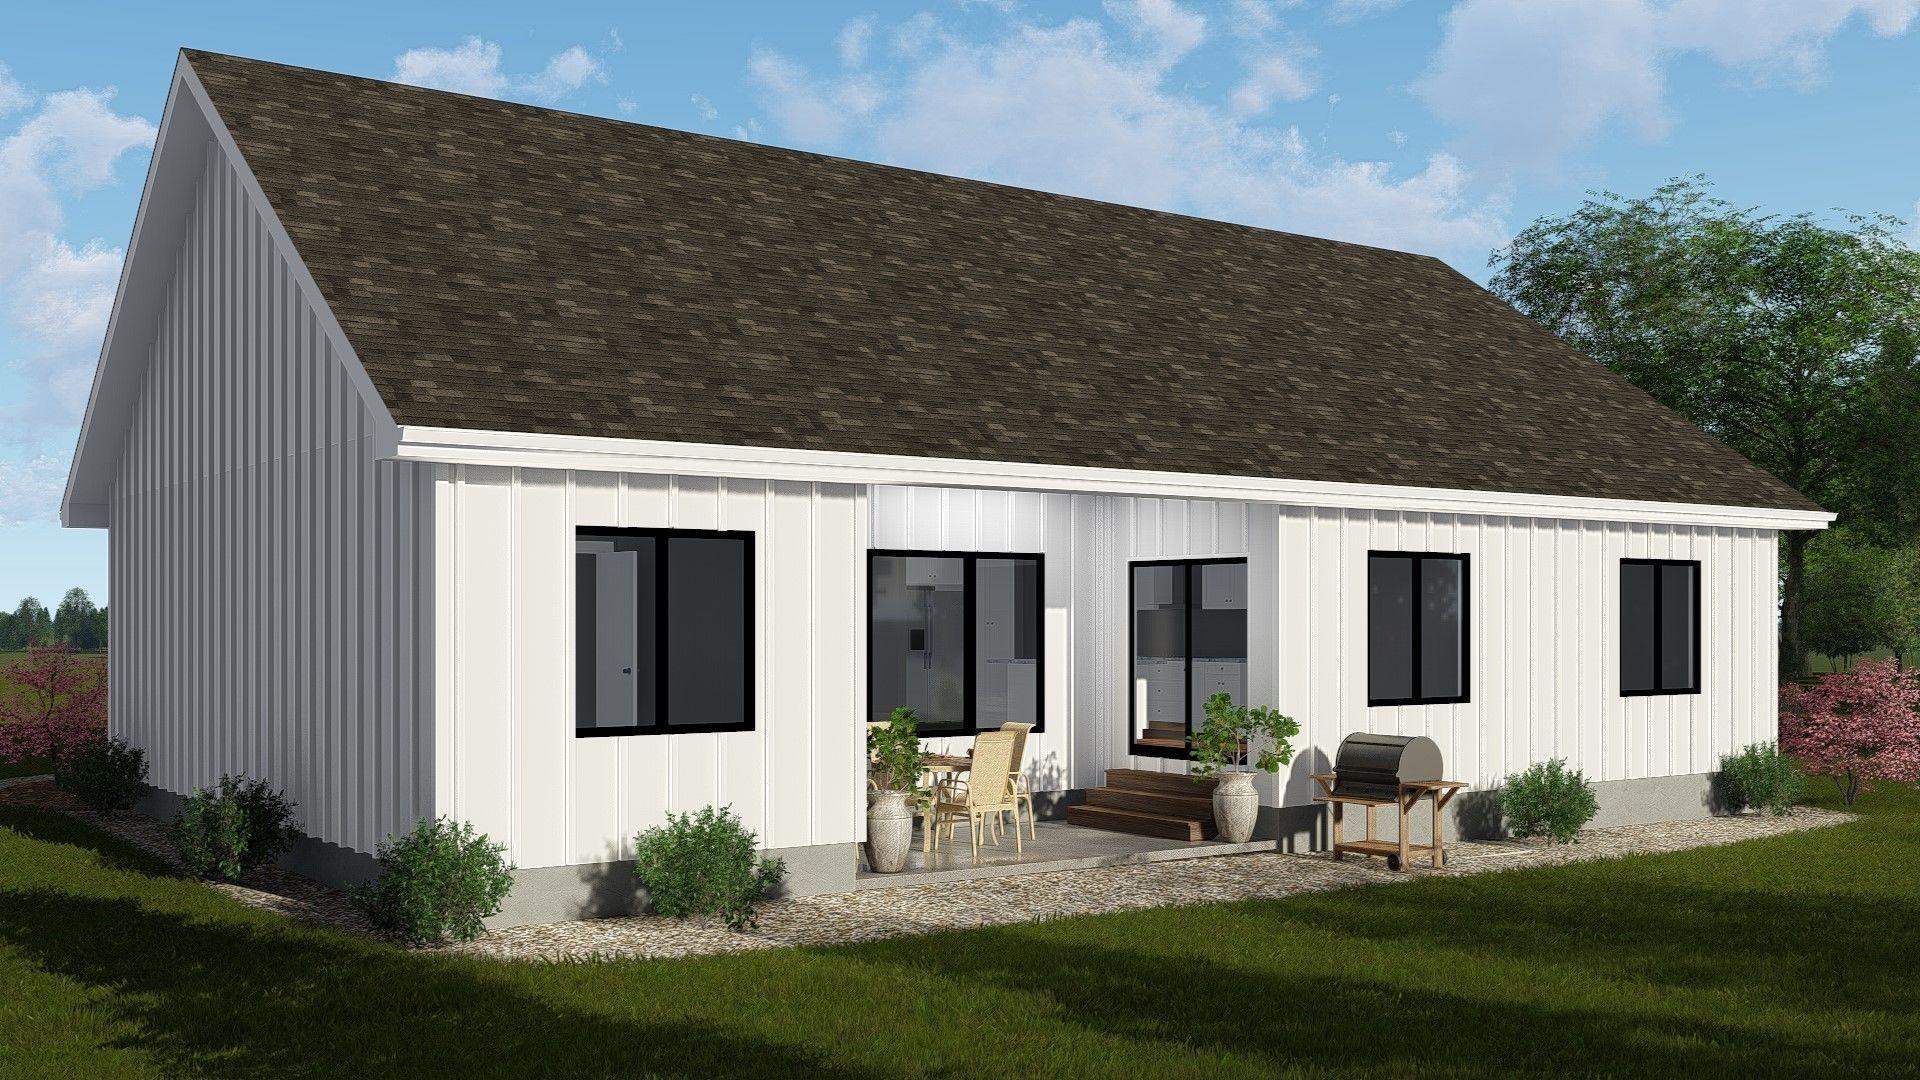 Meadow Grove 1 Story Modern Farmhouse House Plan | Modern ...